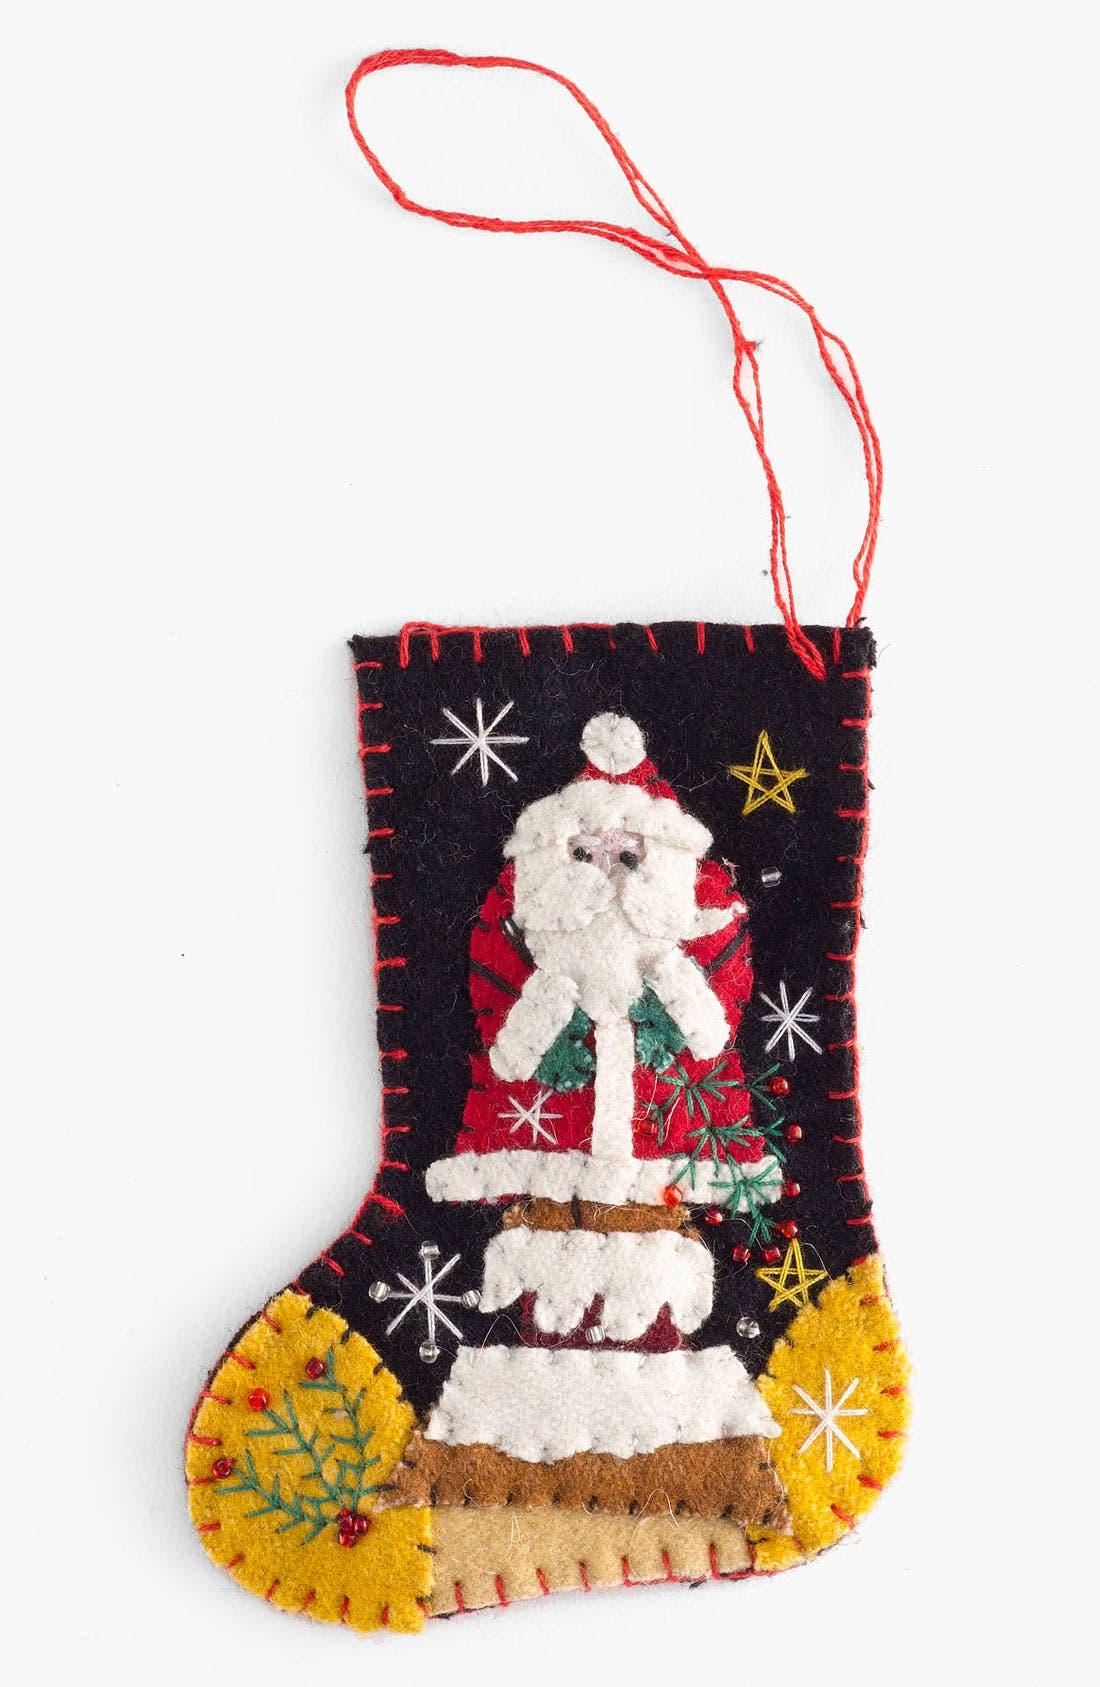 Alternate Image 1 Selected - New World Arts 'Santa on a Chimney' Stocking Ornament